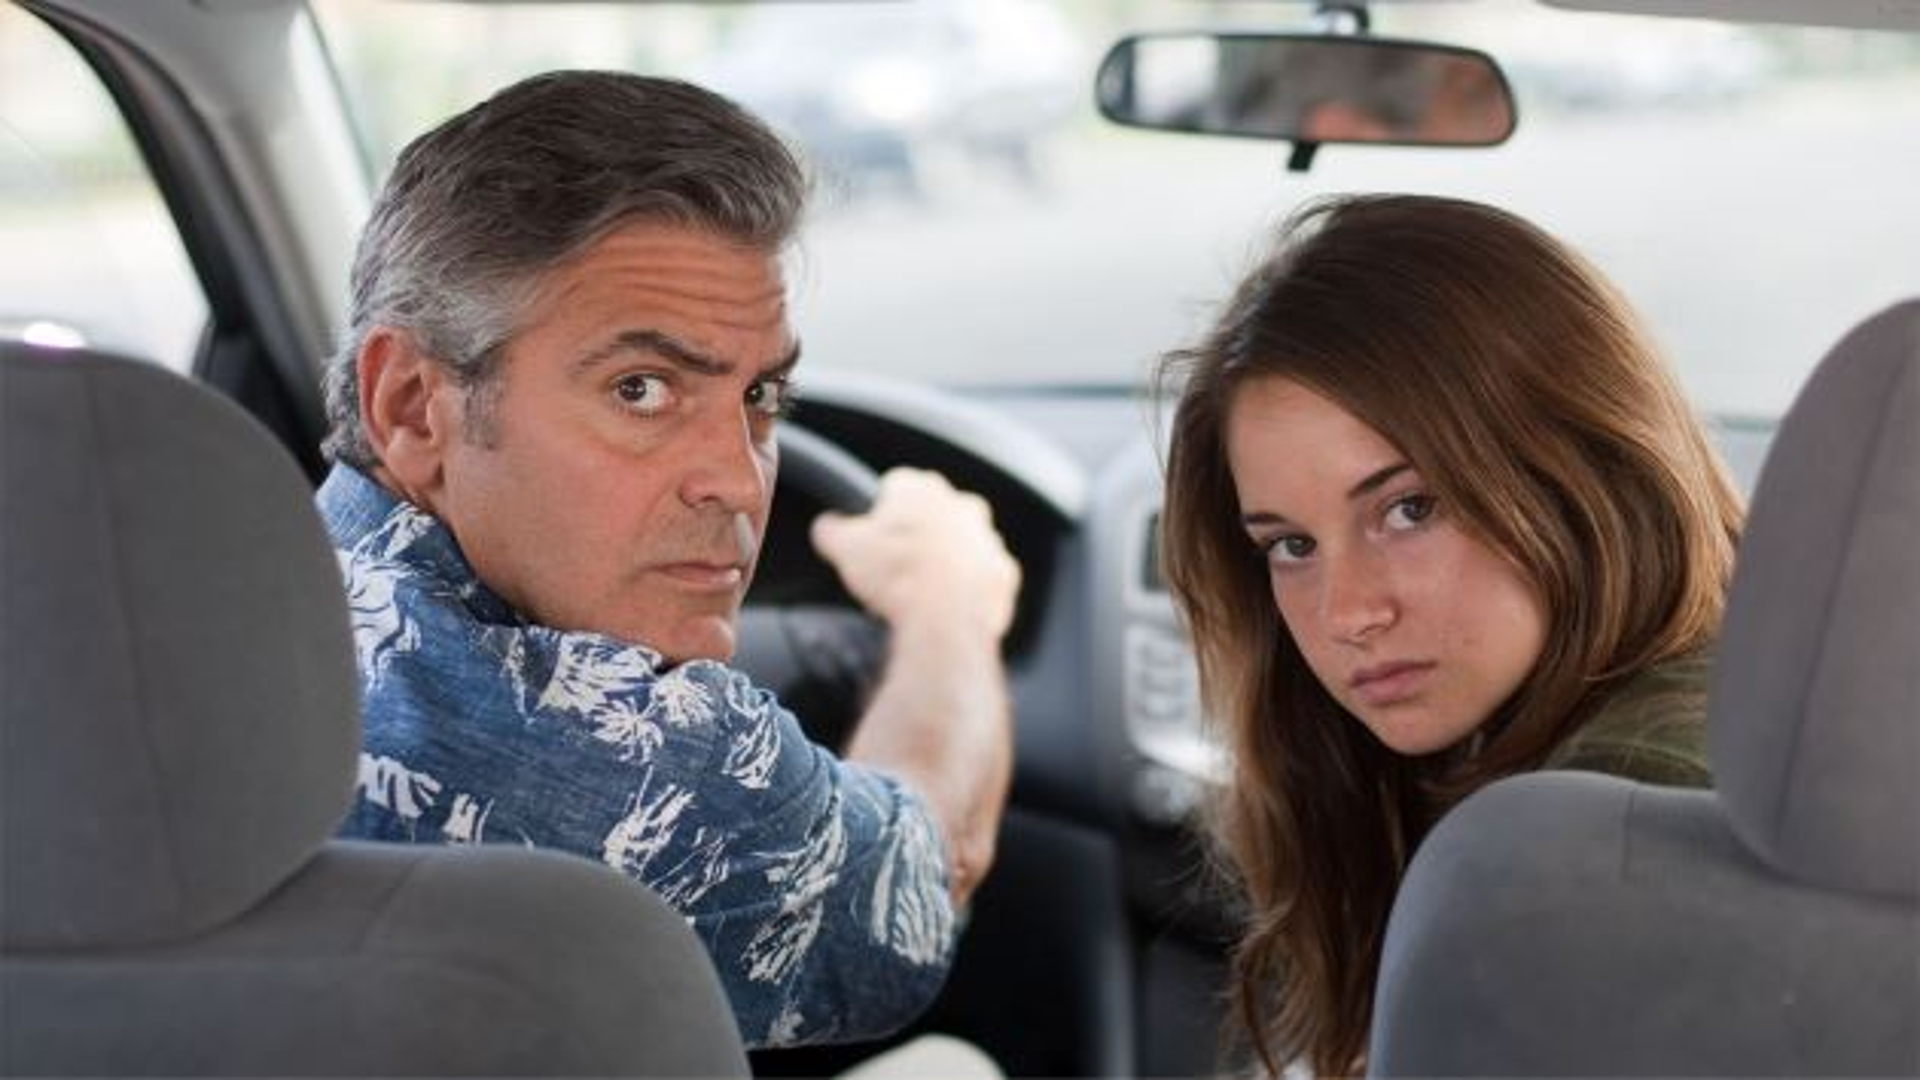 George-Clooney-Shailene-Woodley-the-descendants